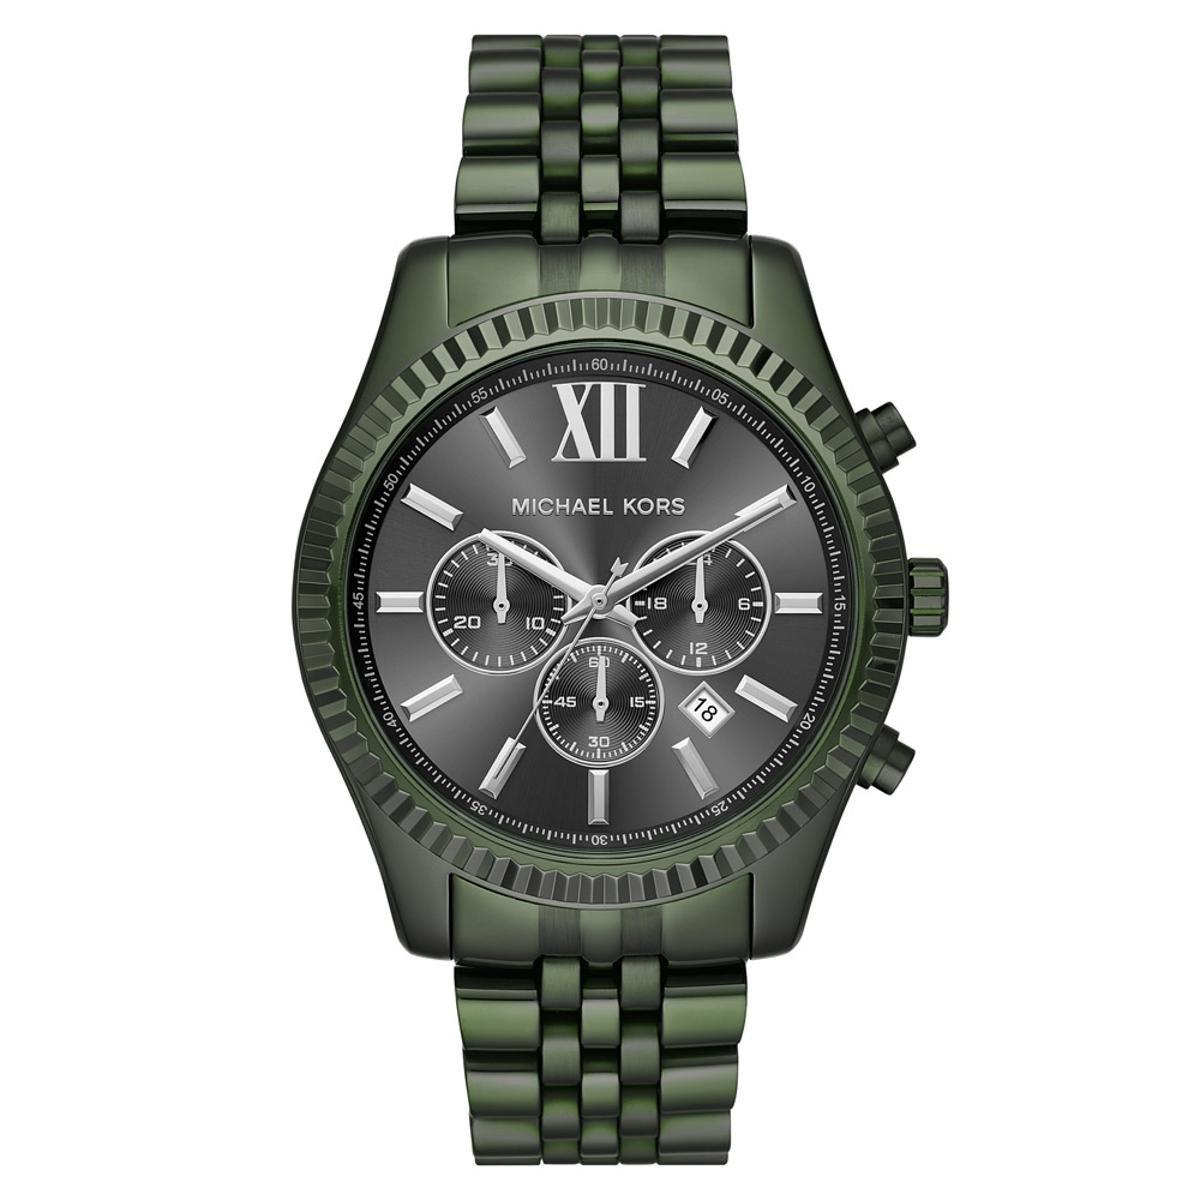 8280446cb17 Relógio Michael Kors Feminino Essential Lexington Verde Militar -  MK8604 1VN MK8604 1VN